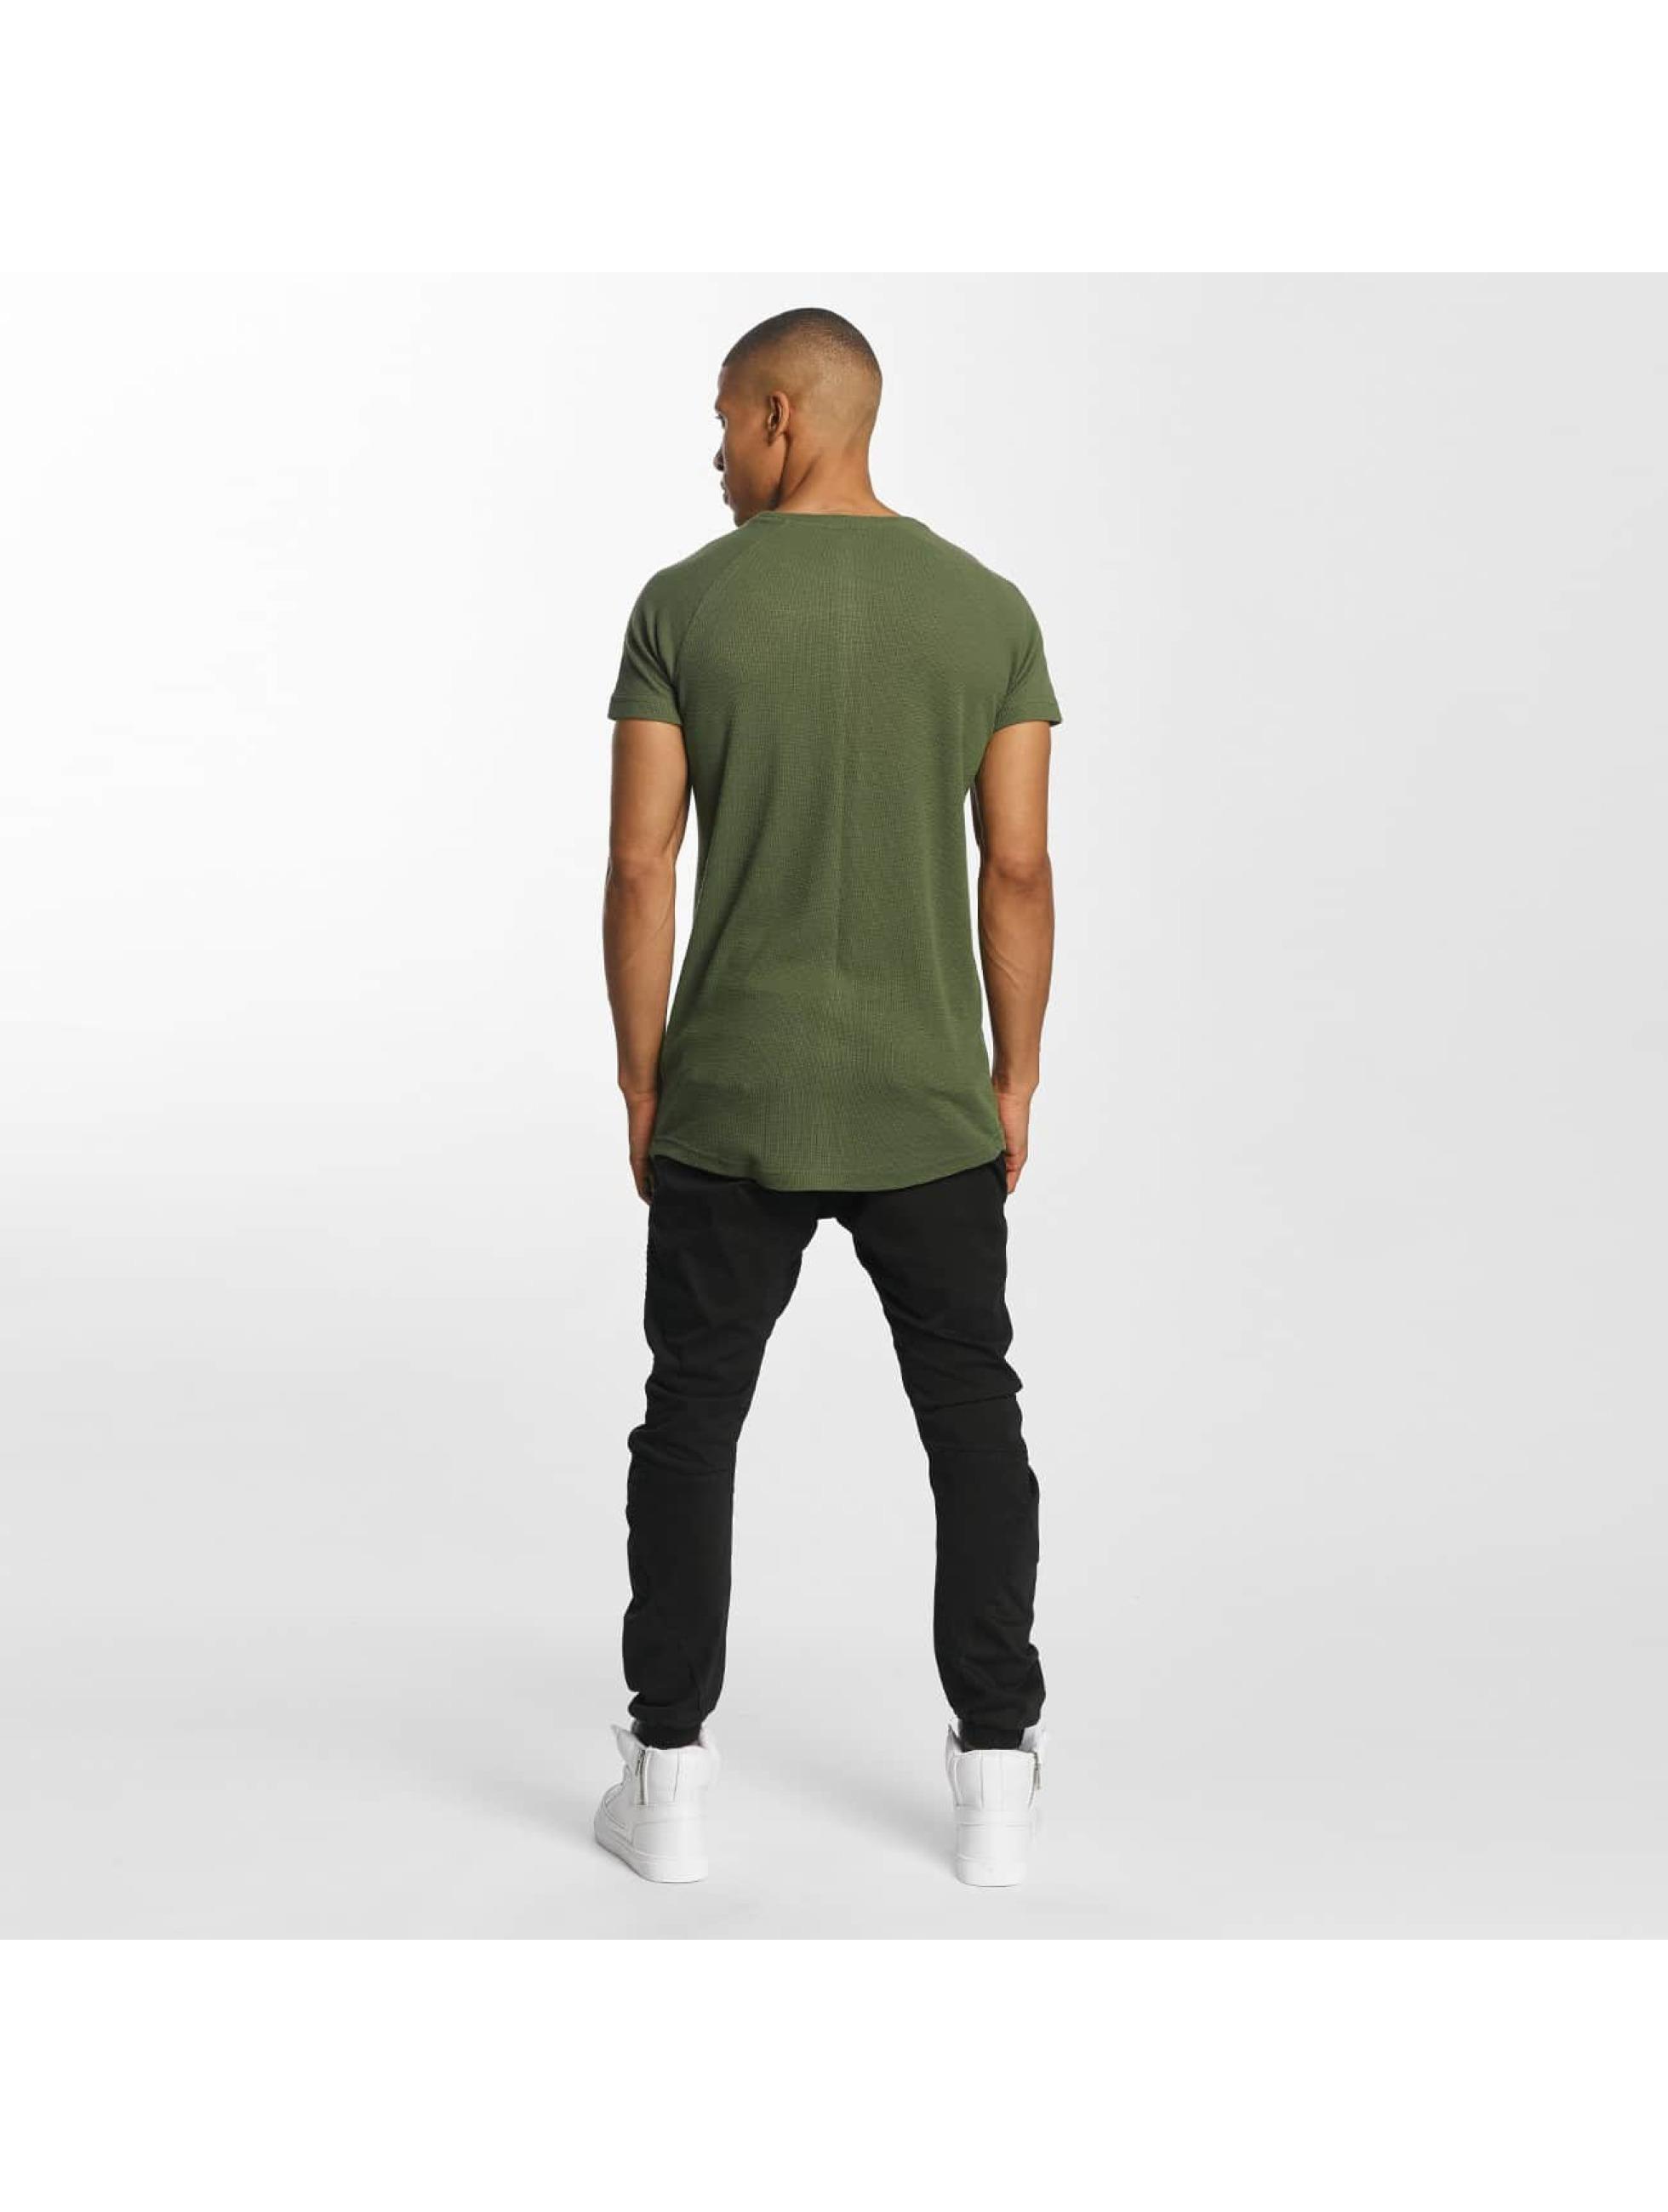 Urban Classics Camiseta Thermal Slub oliva